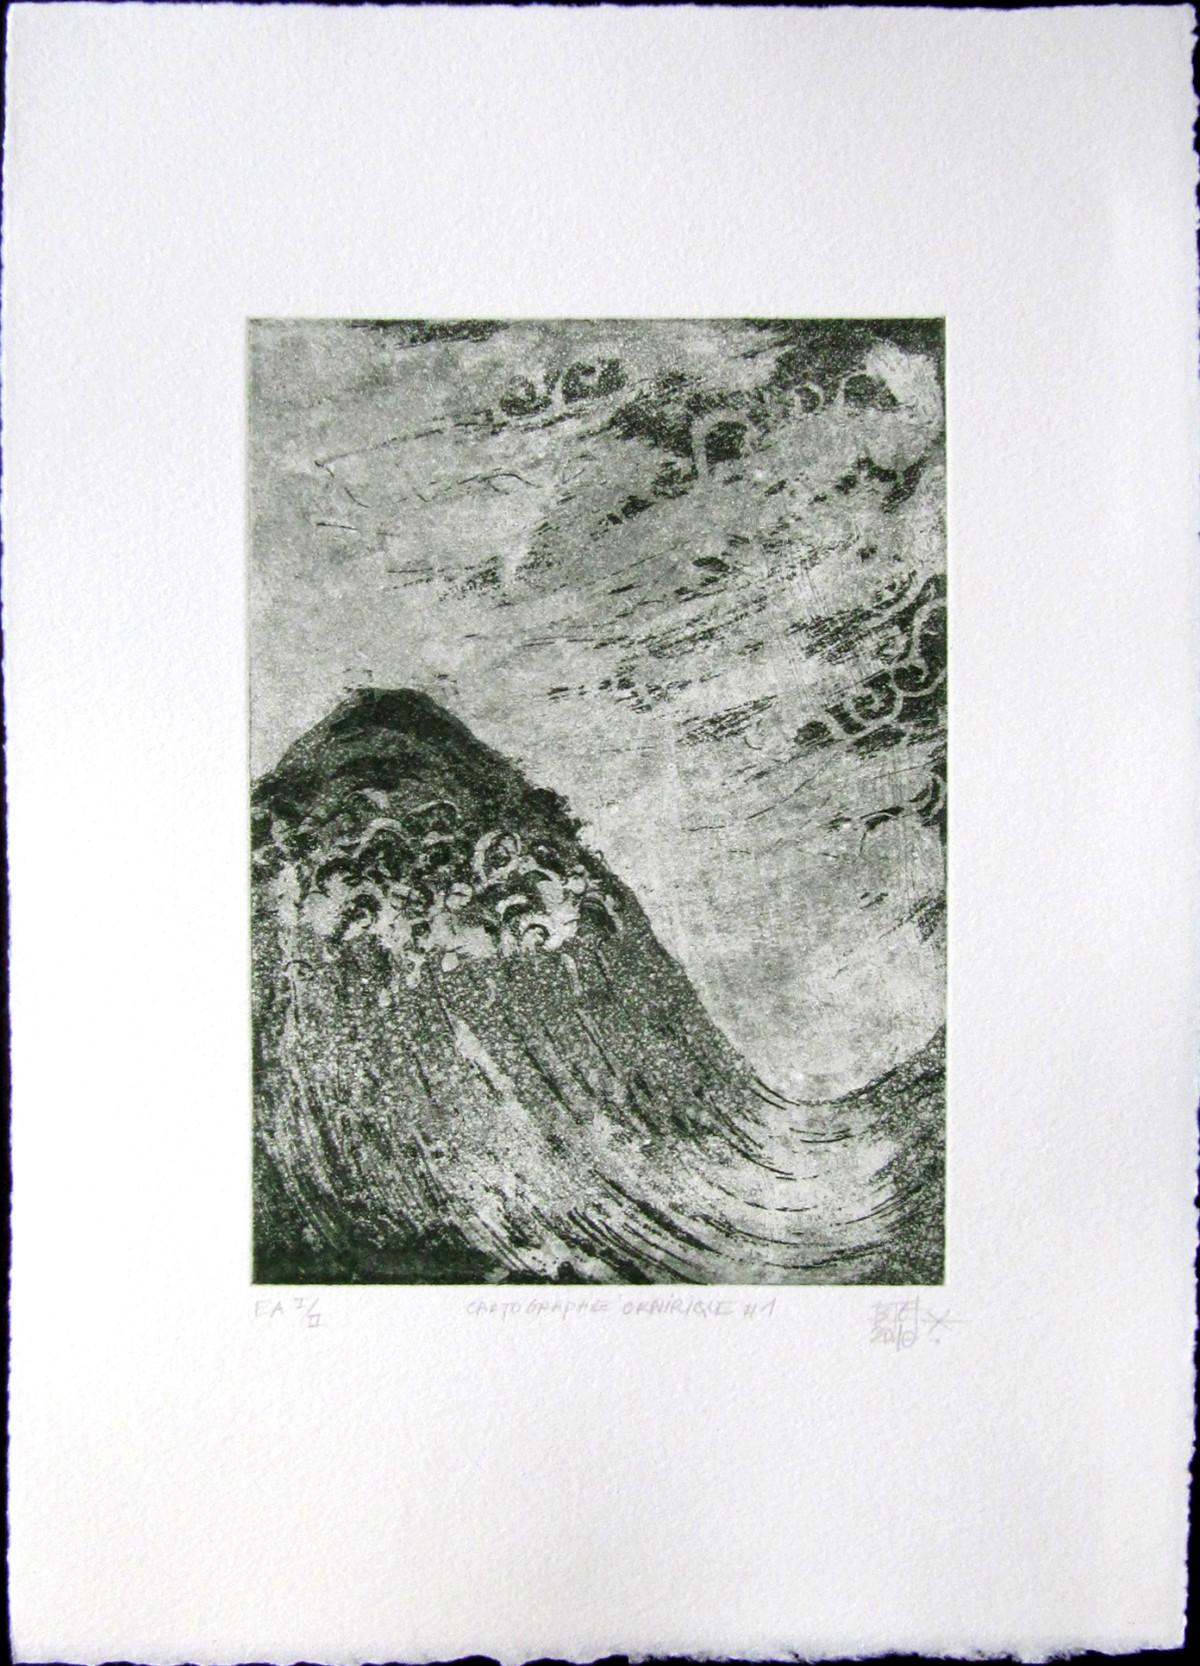 cartographie onirique 1, blandine galtier, gravures, estampes, non-toxic